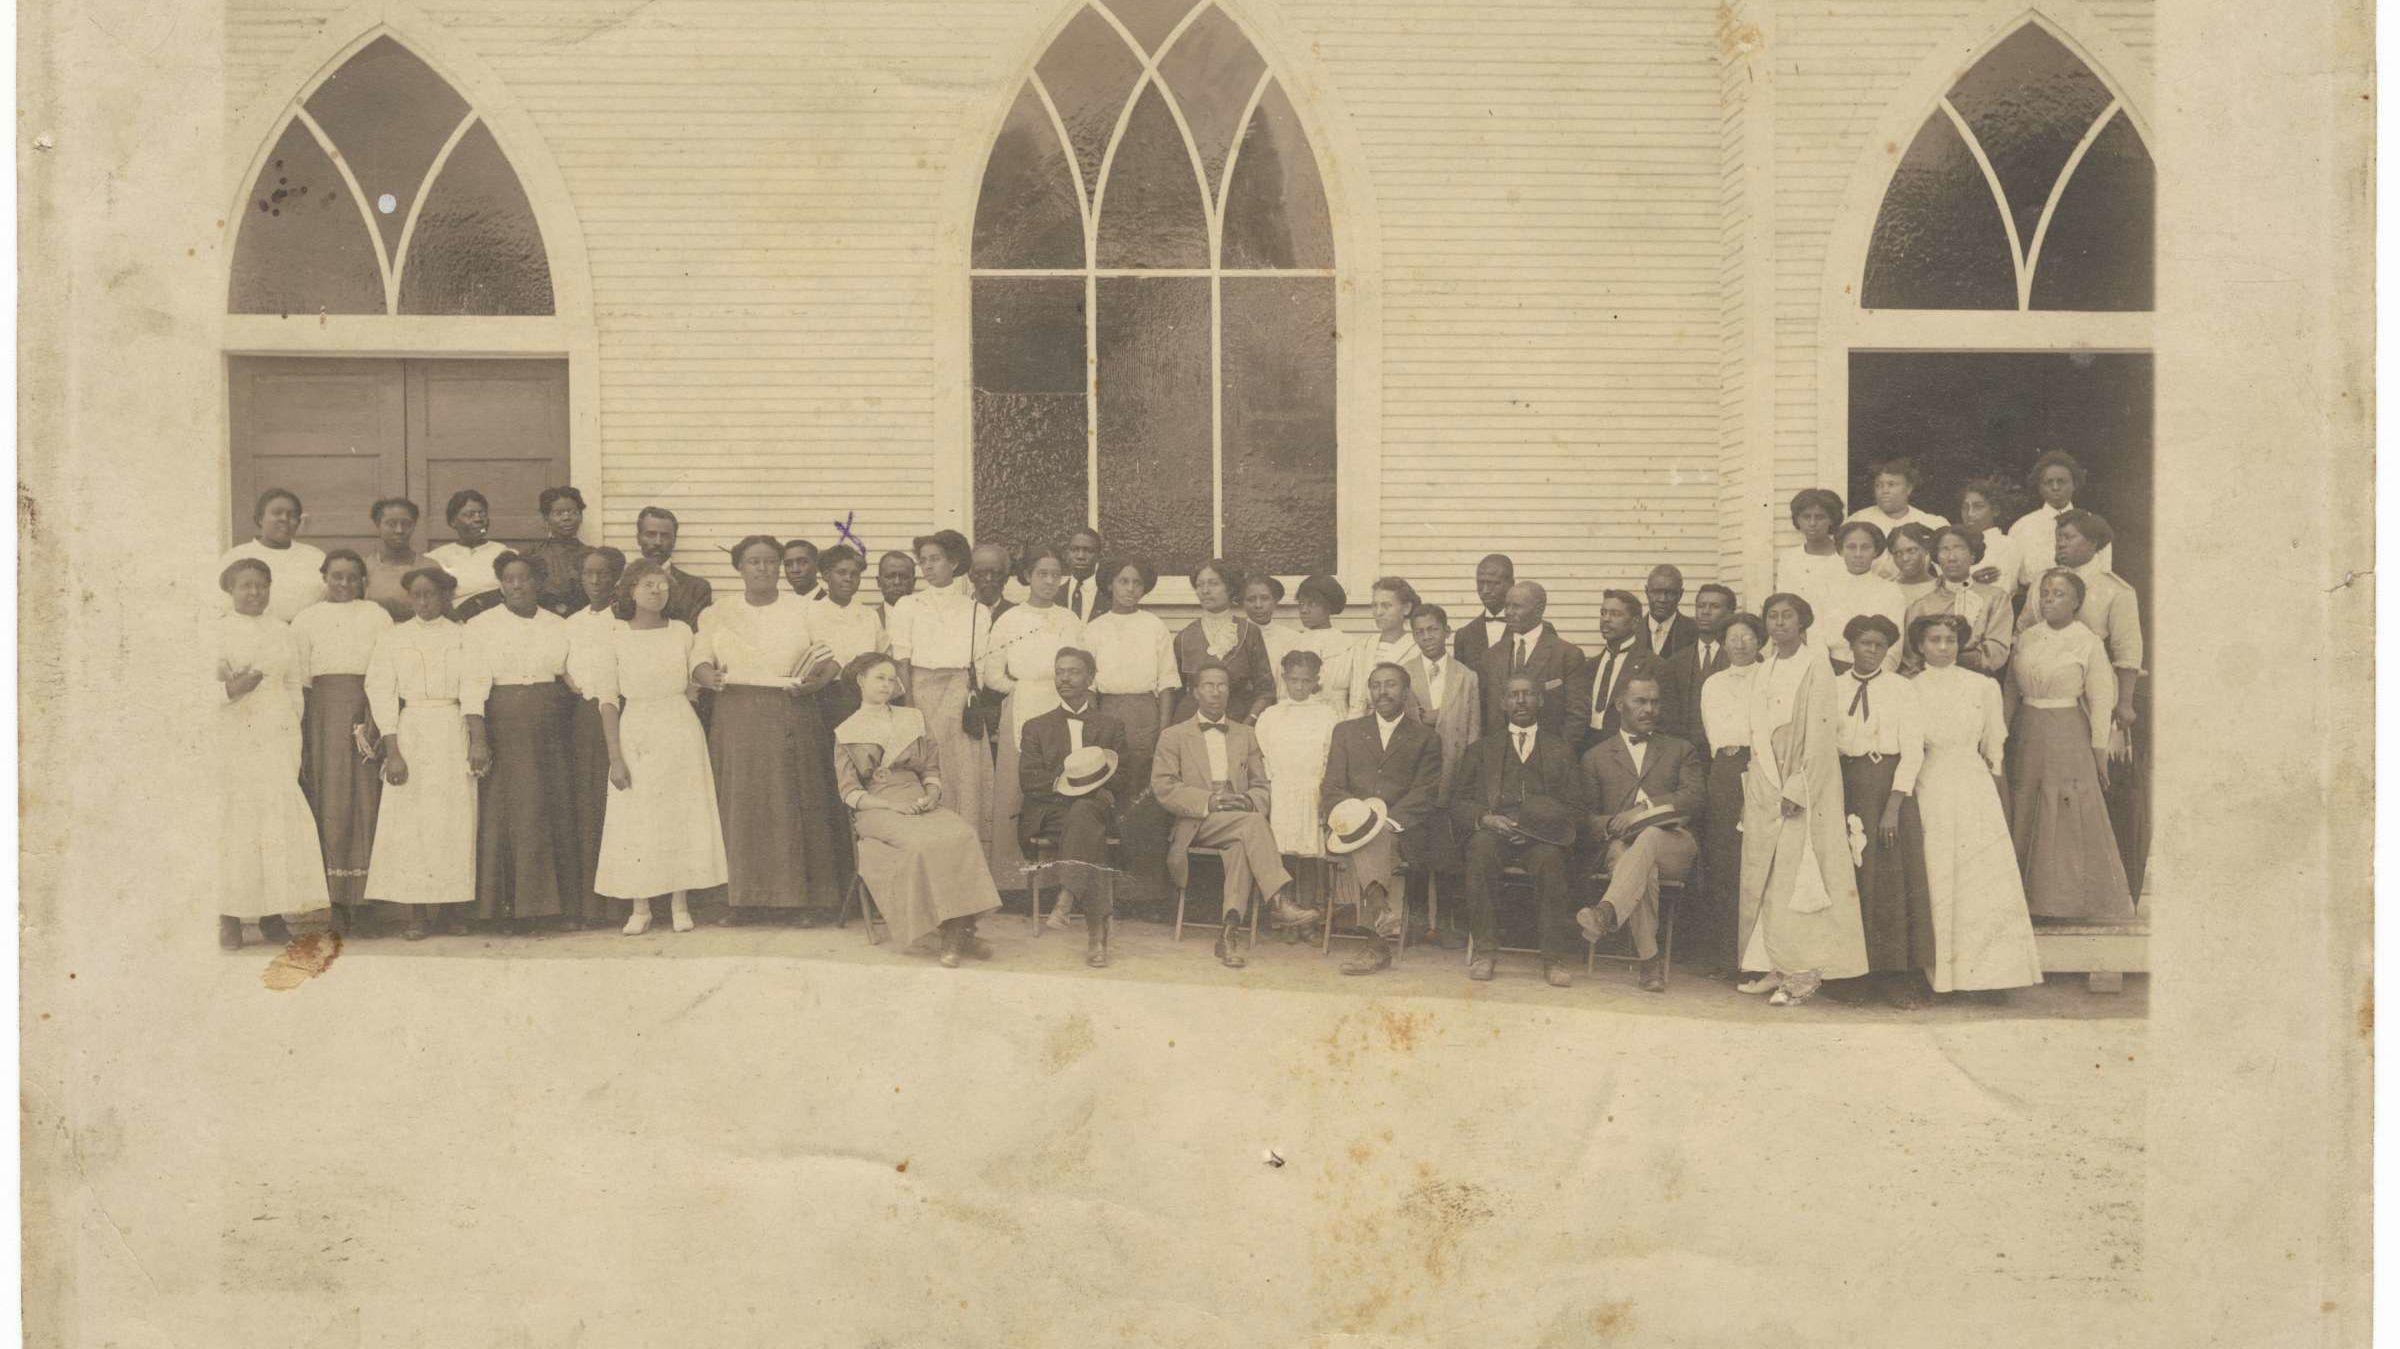 Watch Rare Footage of Tulsa's 'Black Wall Street' Before the 1921 Tulsa Race Massacre